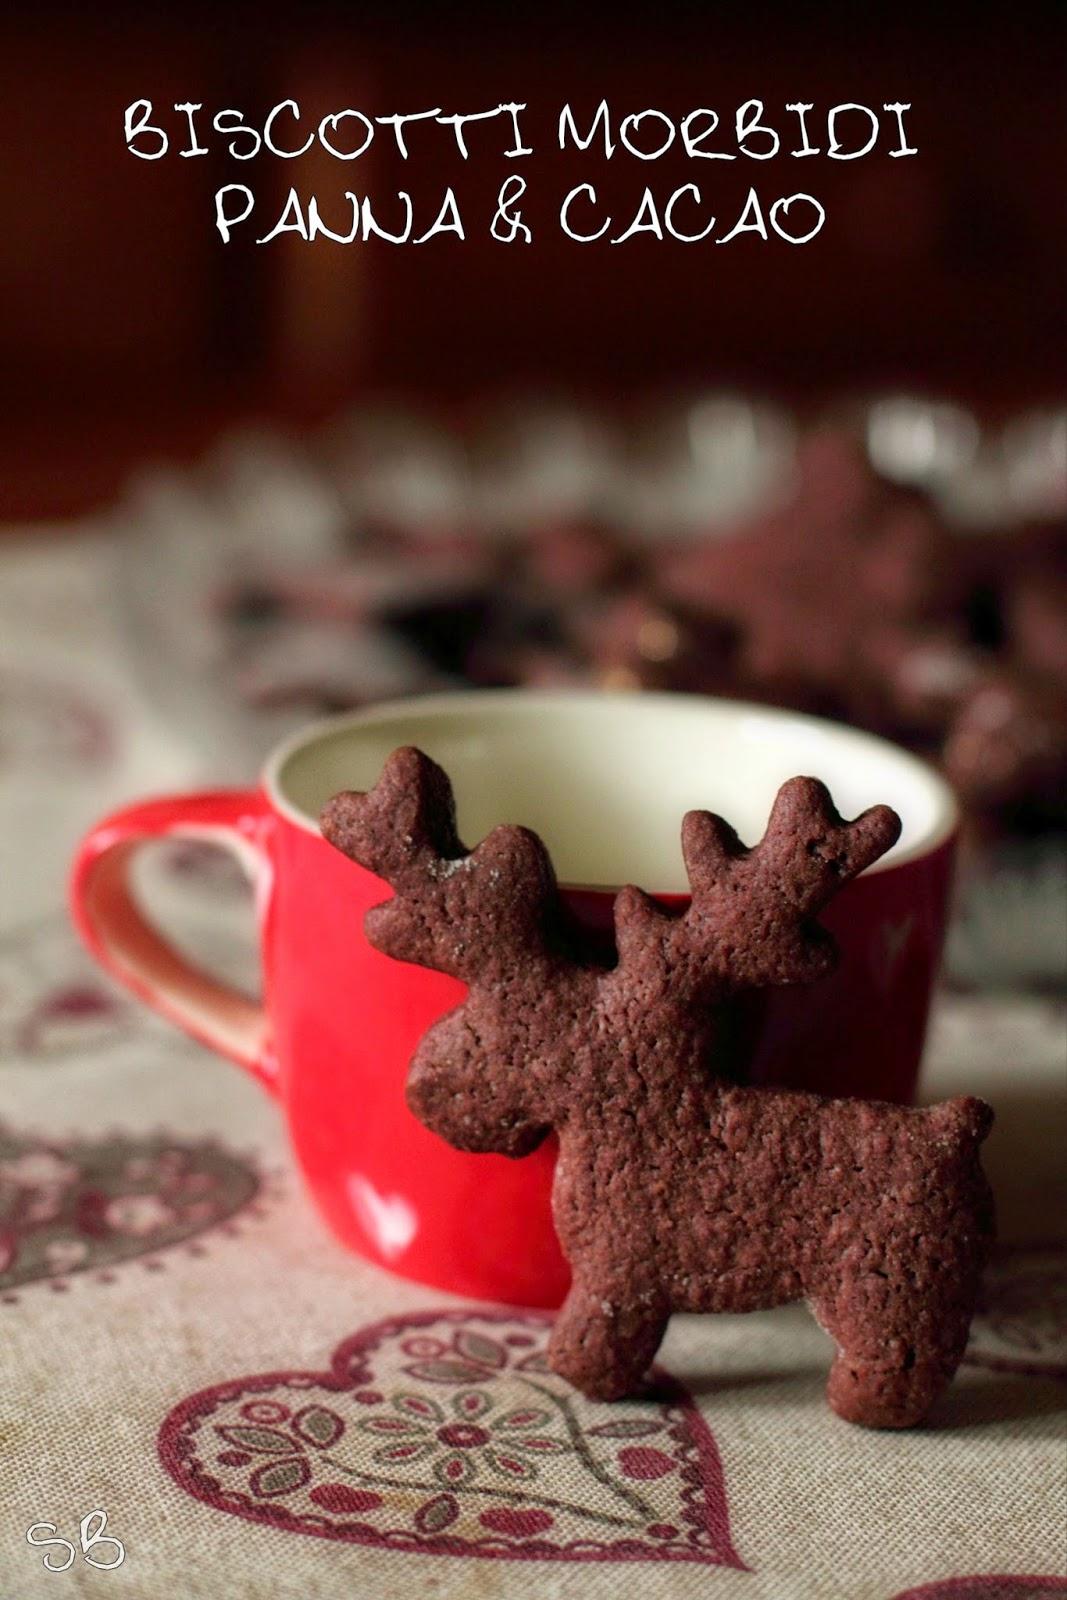 biscotti morbidi panna & cacao